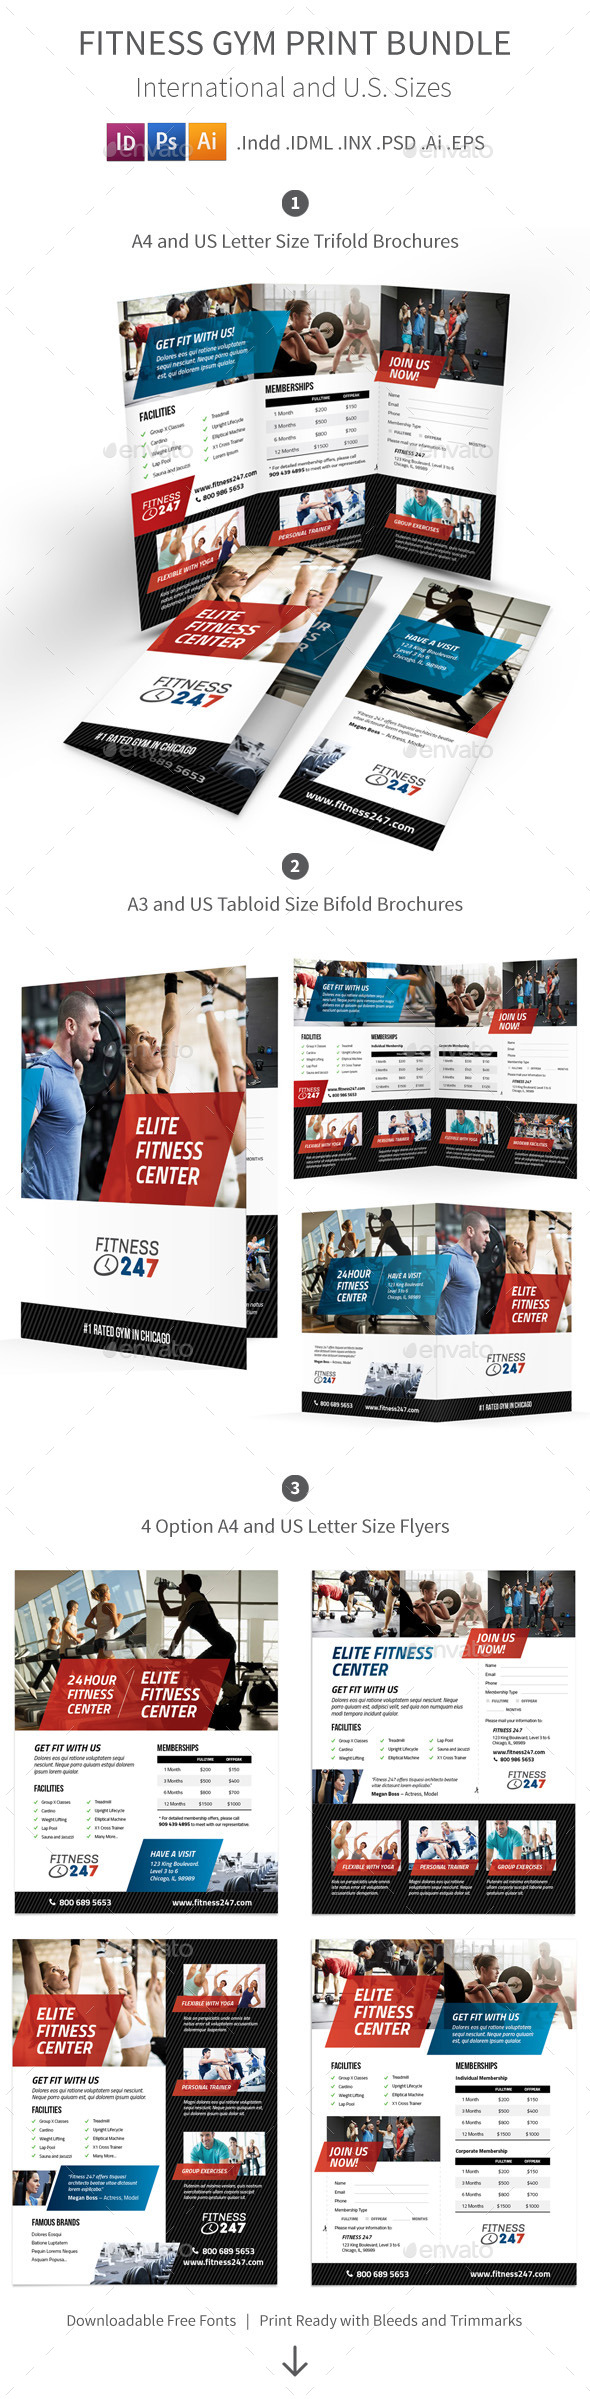 Fitness Gym Print Bundle - Informational Brochures